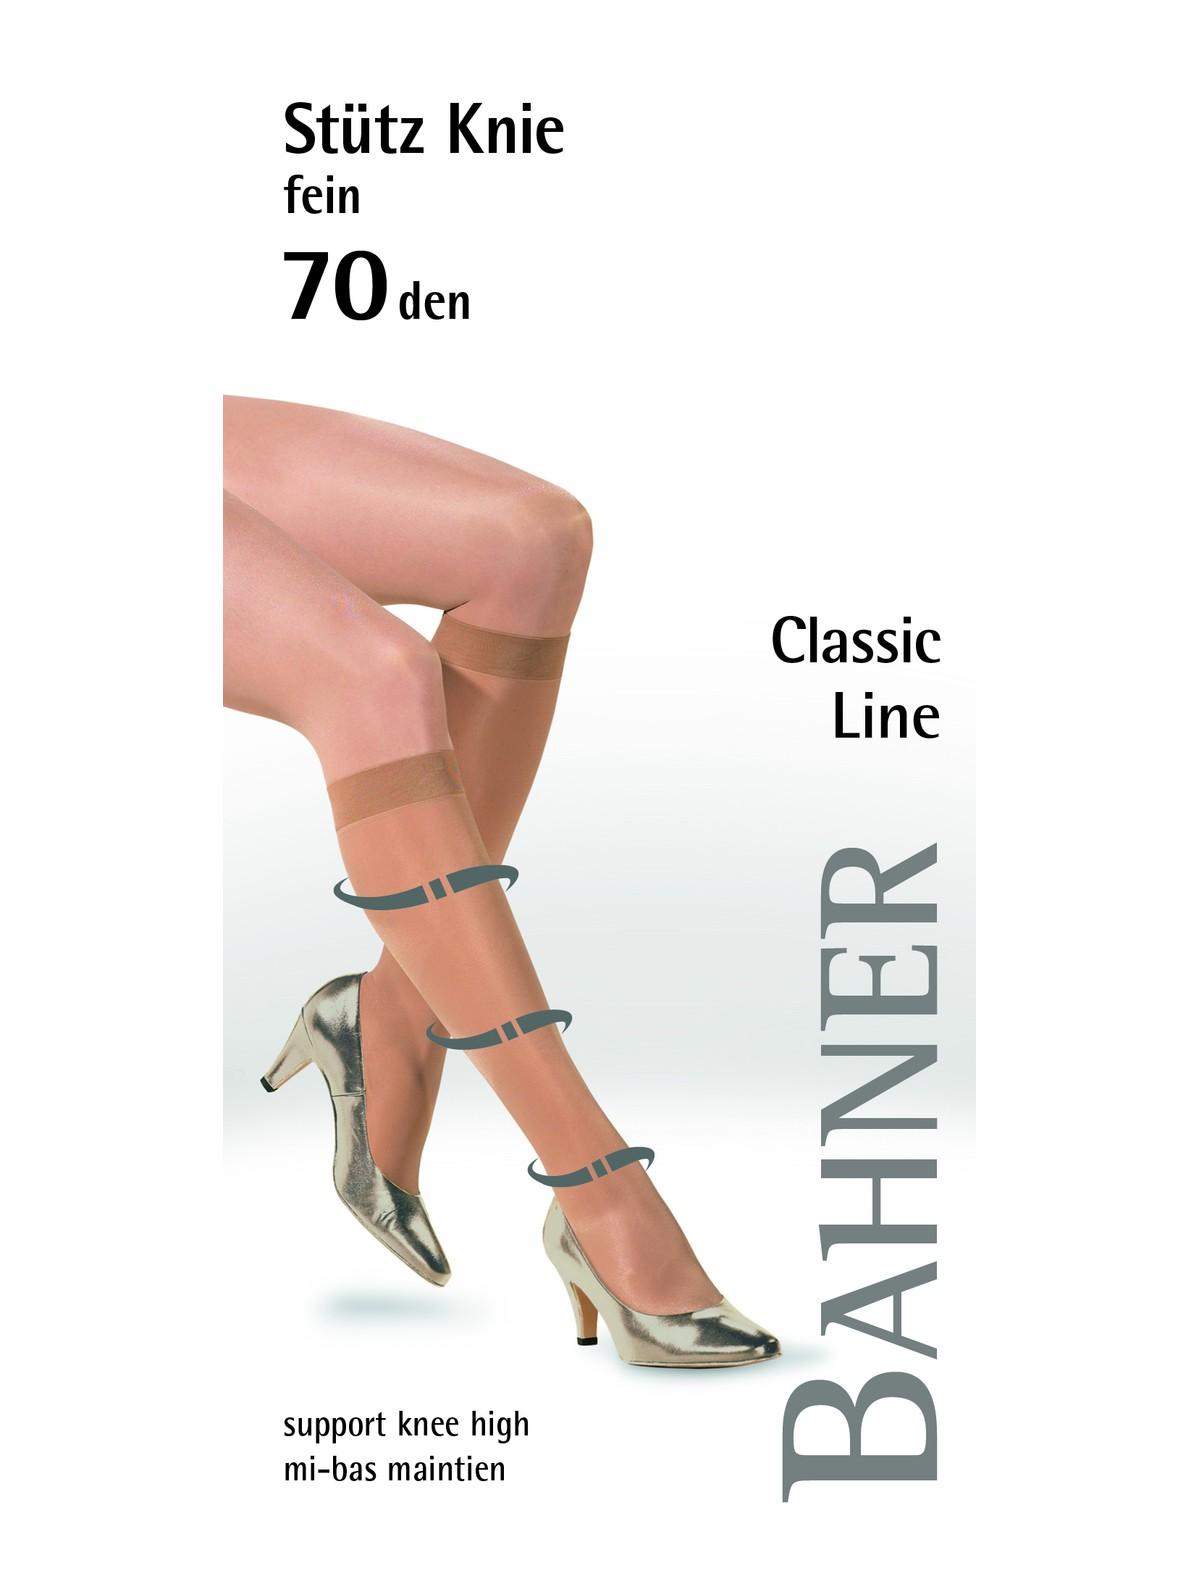 ff9e4428cef Bahner Classic Line Compression Knee High Socks